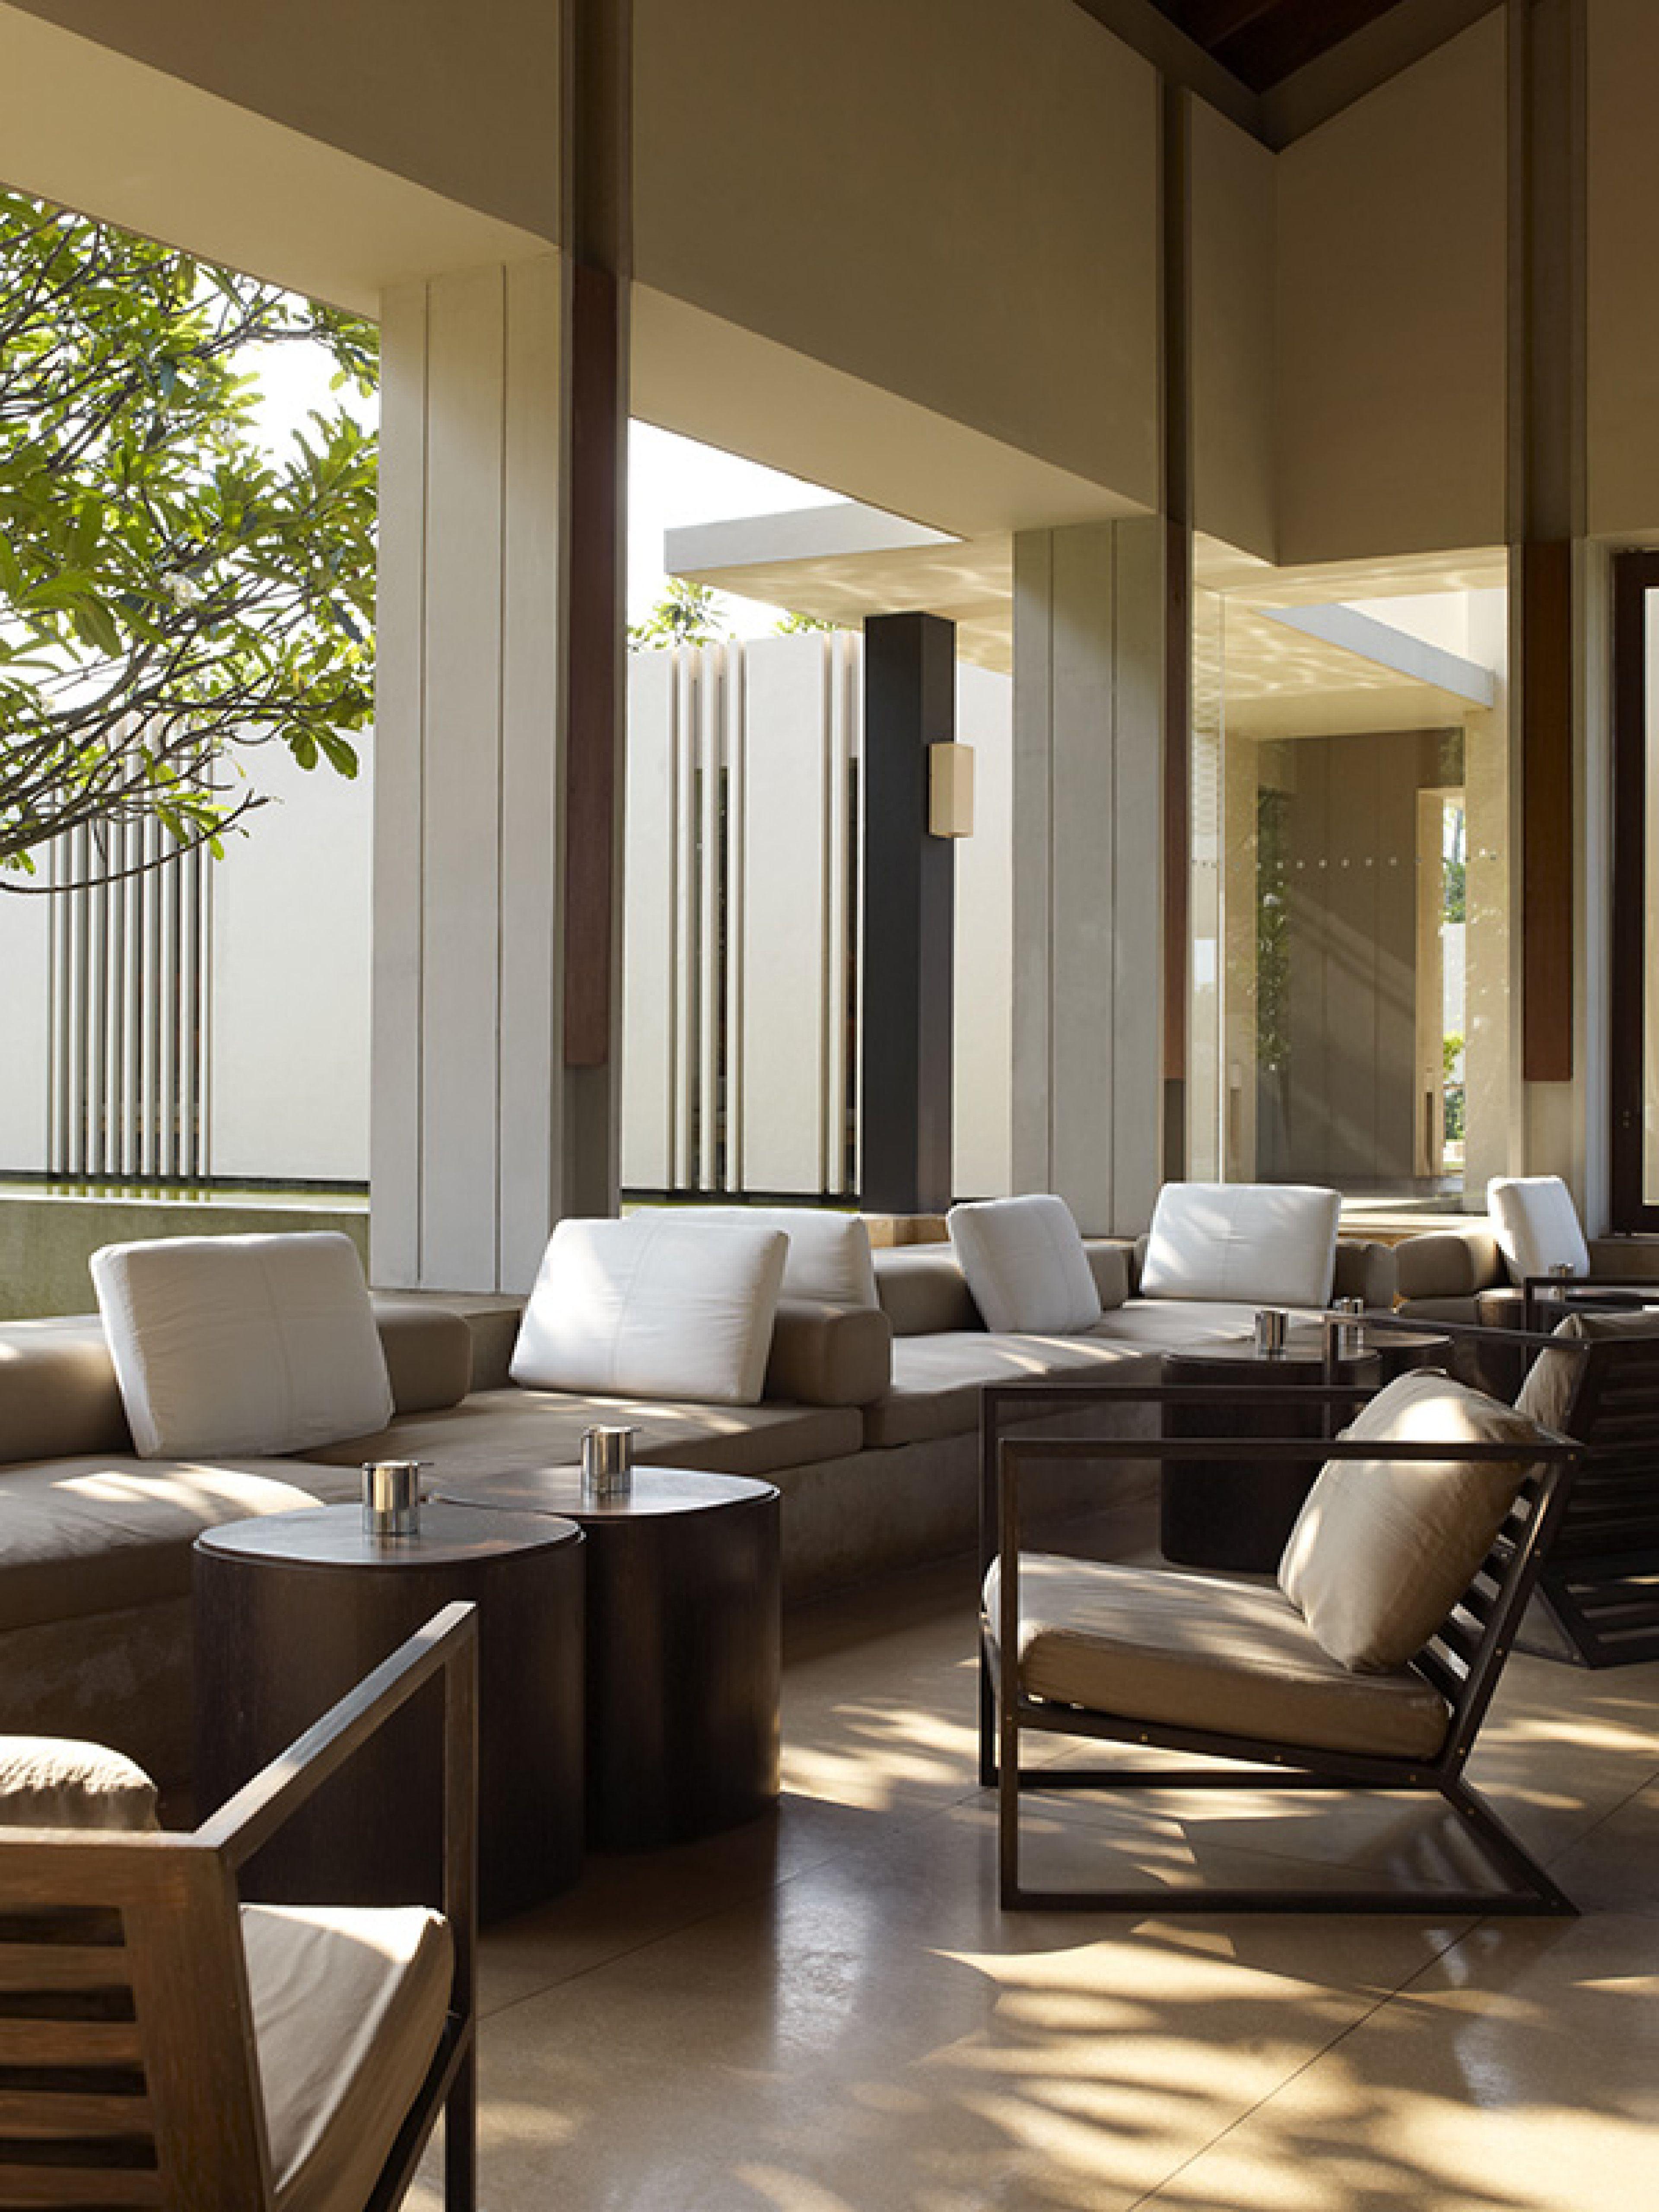 Amanwella - Explore Luxury Resort In Sri Lanka